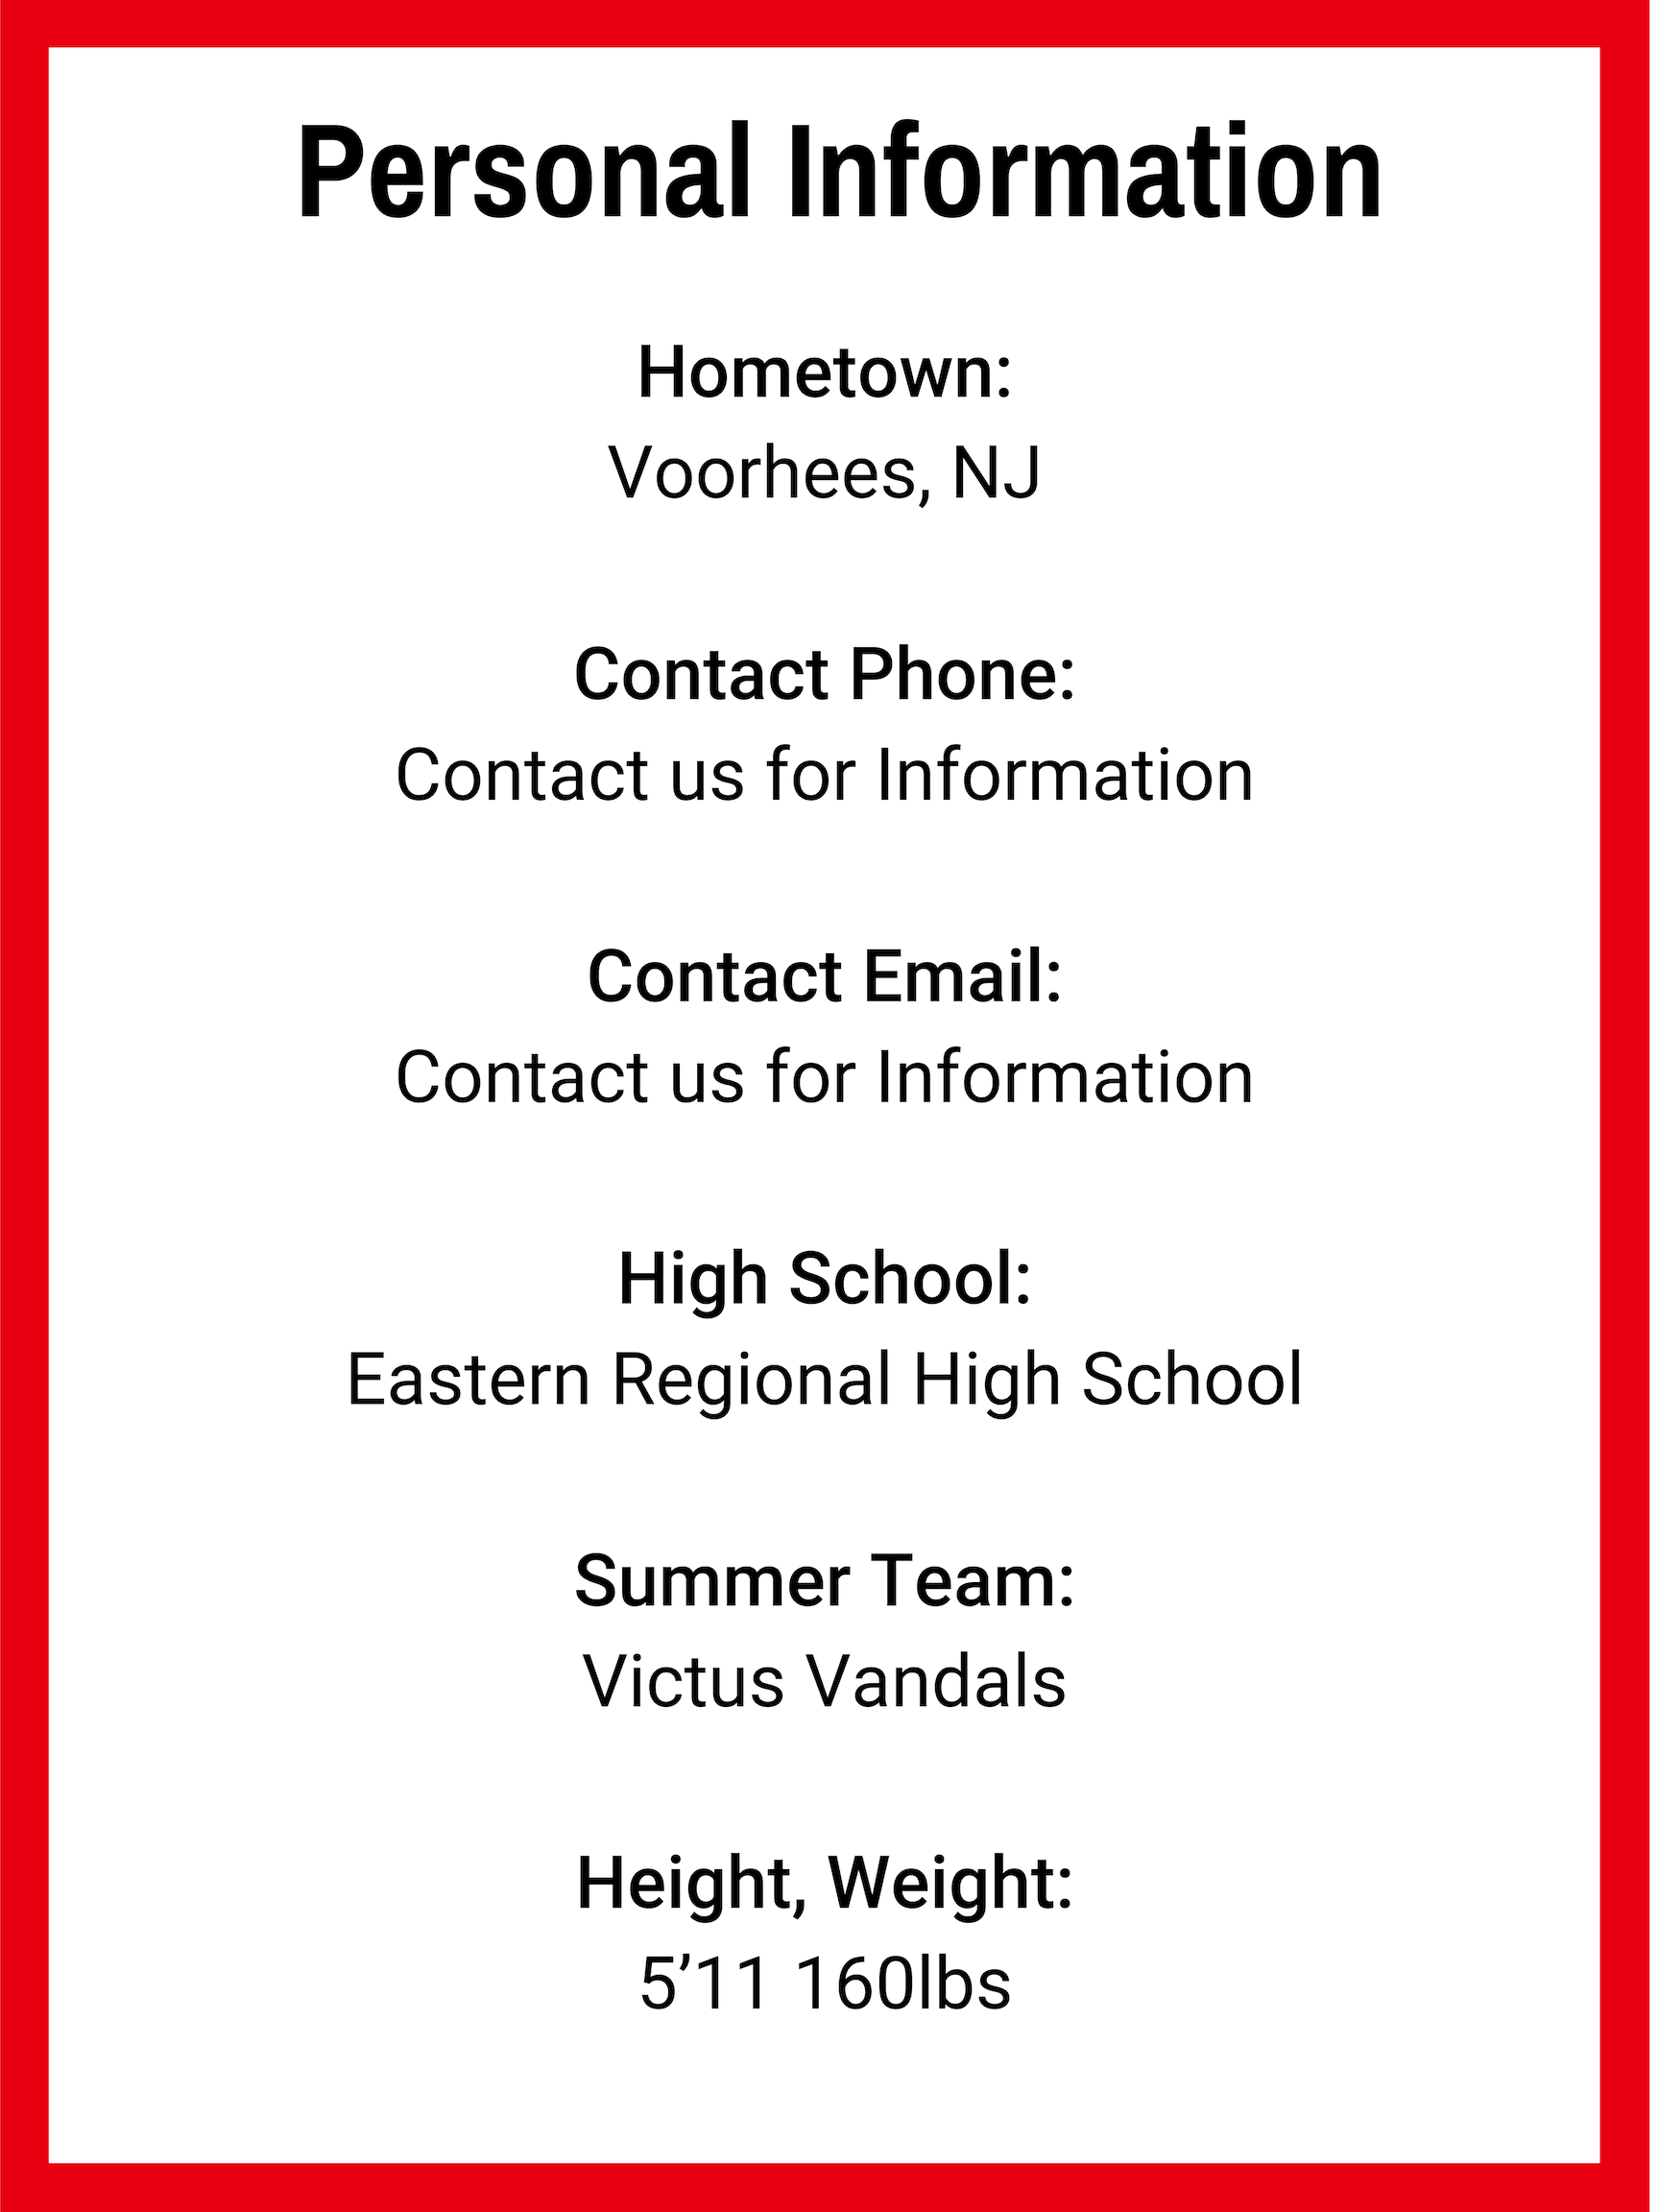 Hometown_ Voorhees, NJ Contact Phone_ Contact us for Information Contact Email_ Contact us for Information High School_ Eastern Regional High School Summer Team_ Victus Vandals Height, Weight_ 5'11 160lbs (1).png